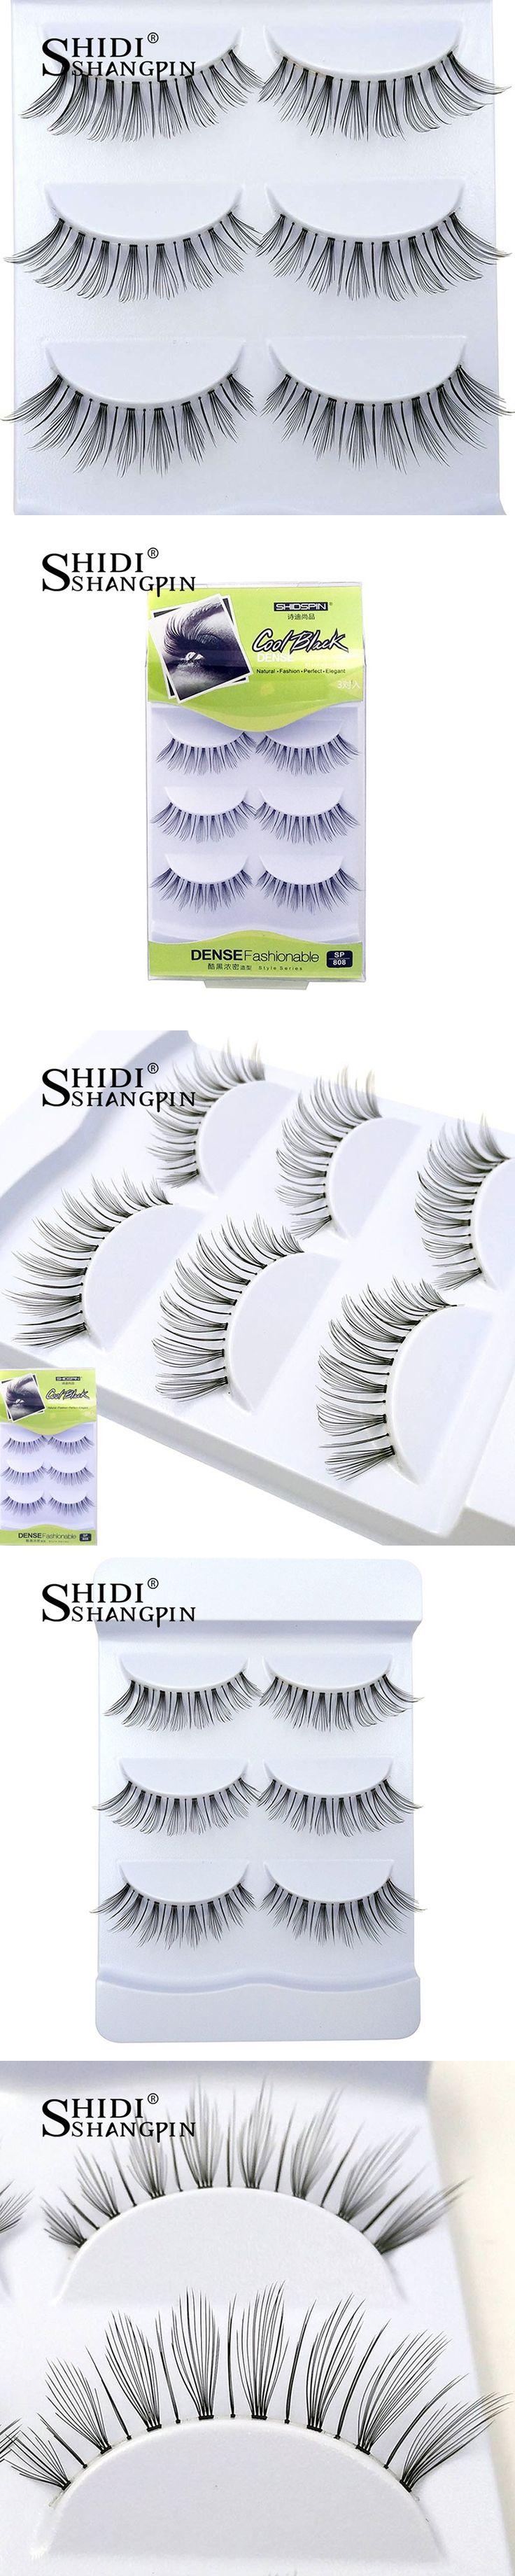 Leaf Type Handmade False Eyelashes Emulate Hair Makeup Tool Transparent Fake Lashes Soft Thin Faux Extension Kit 3 Pairs